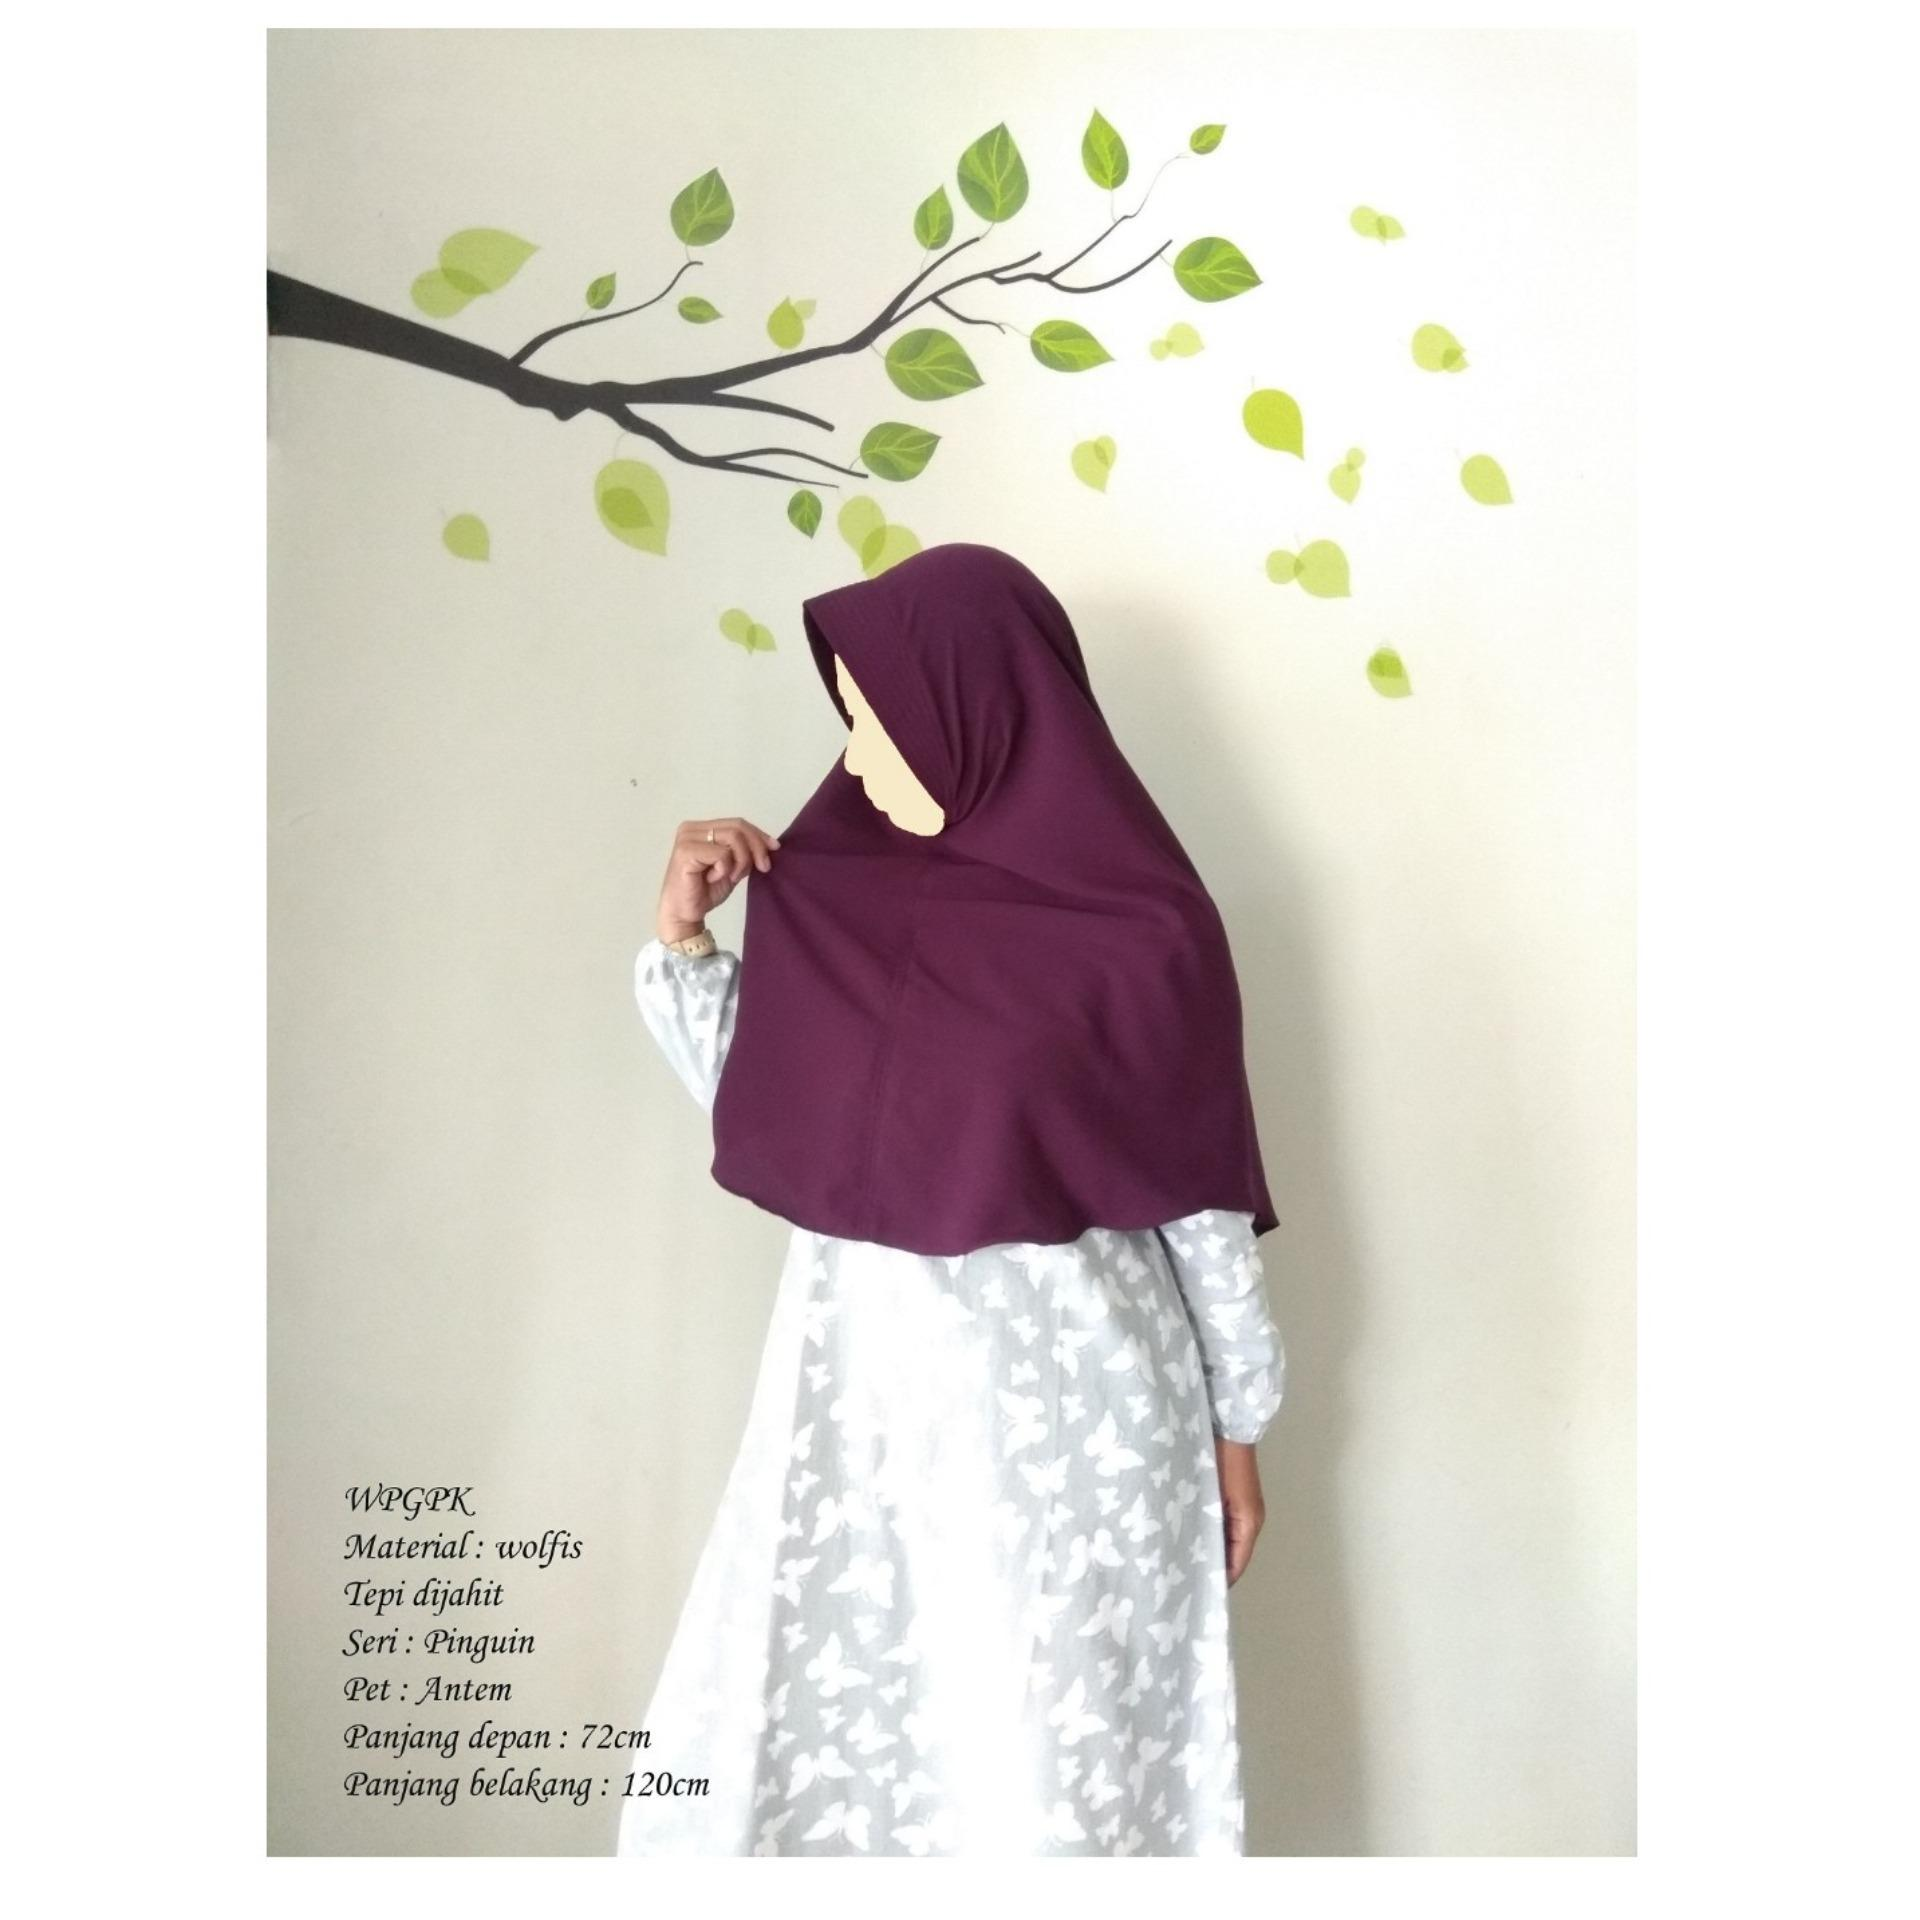 TBIJ - HIjab/Jilbab/Khimar Syari Al Qudwah - Hijab/Jilbab Instan - Bahan Wolfis - Hijab Syar'i - Ukuran M